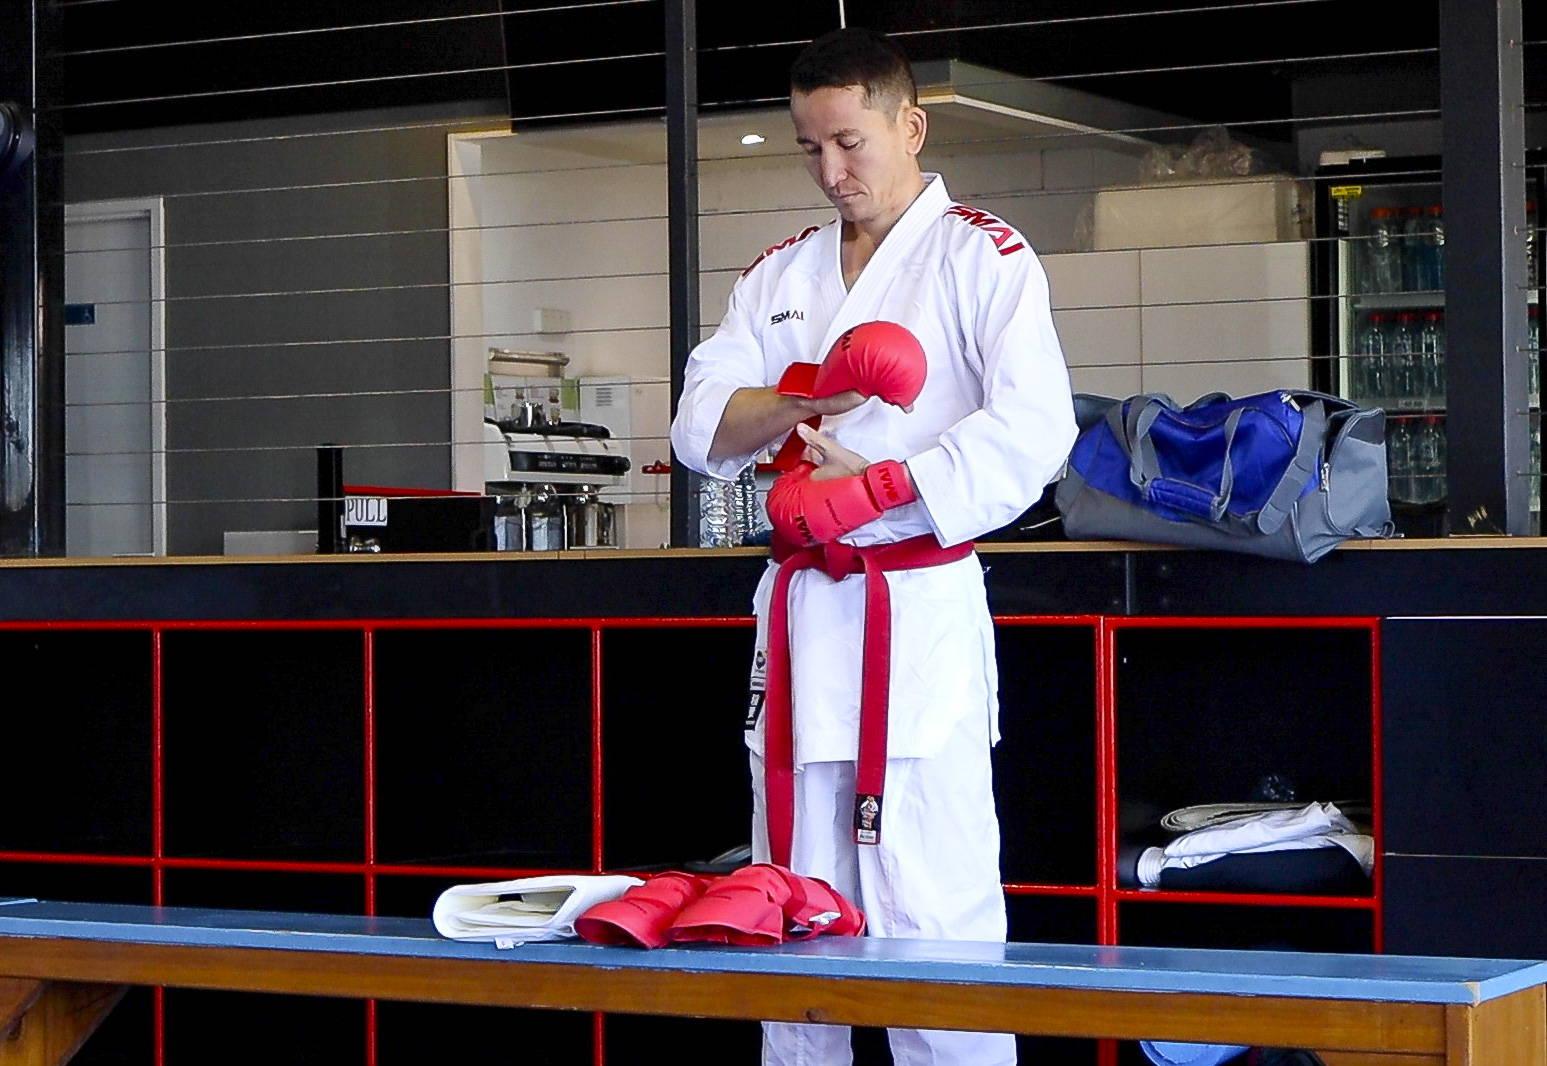 Asif Sultani KArate Athlete Tokyo Olympics Refugee Team 2020 prepares for training